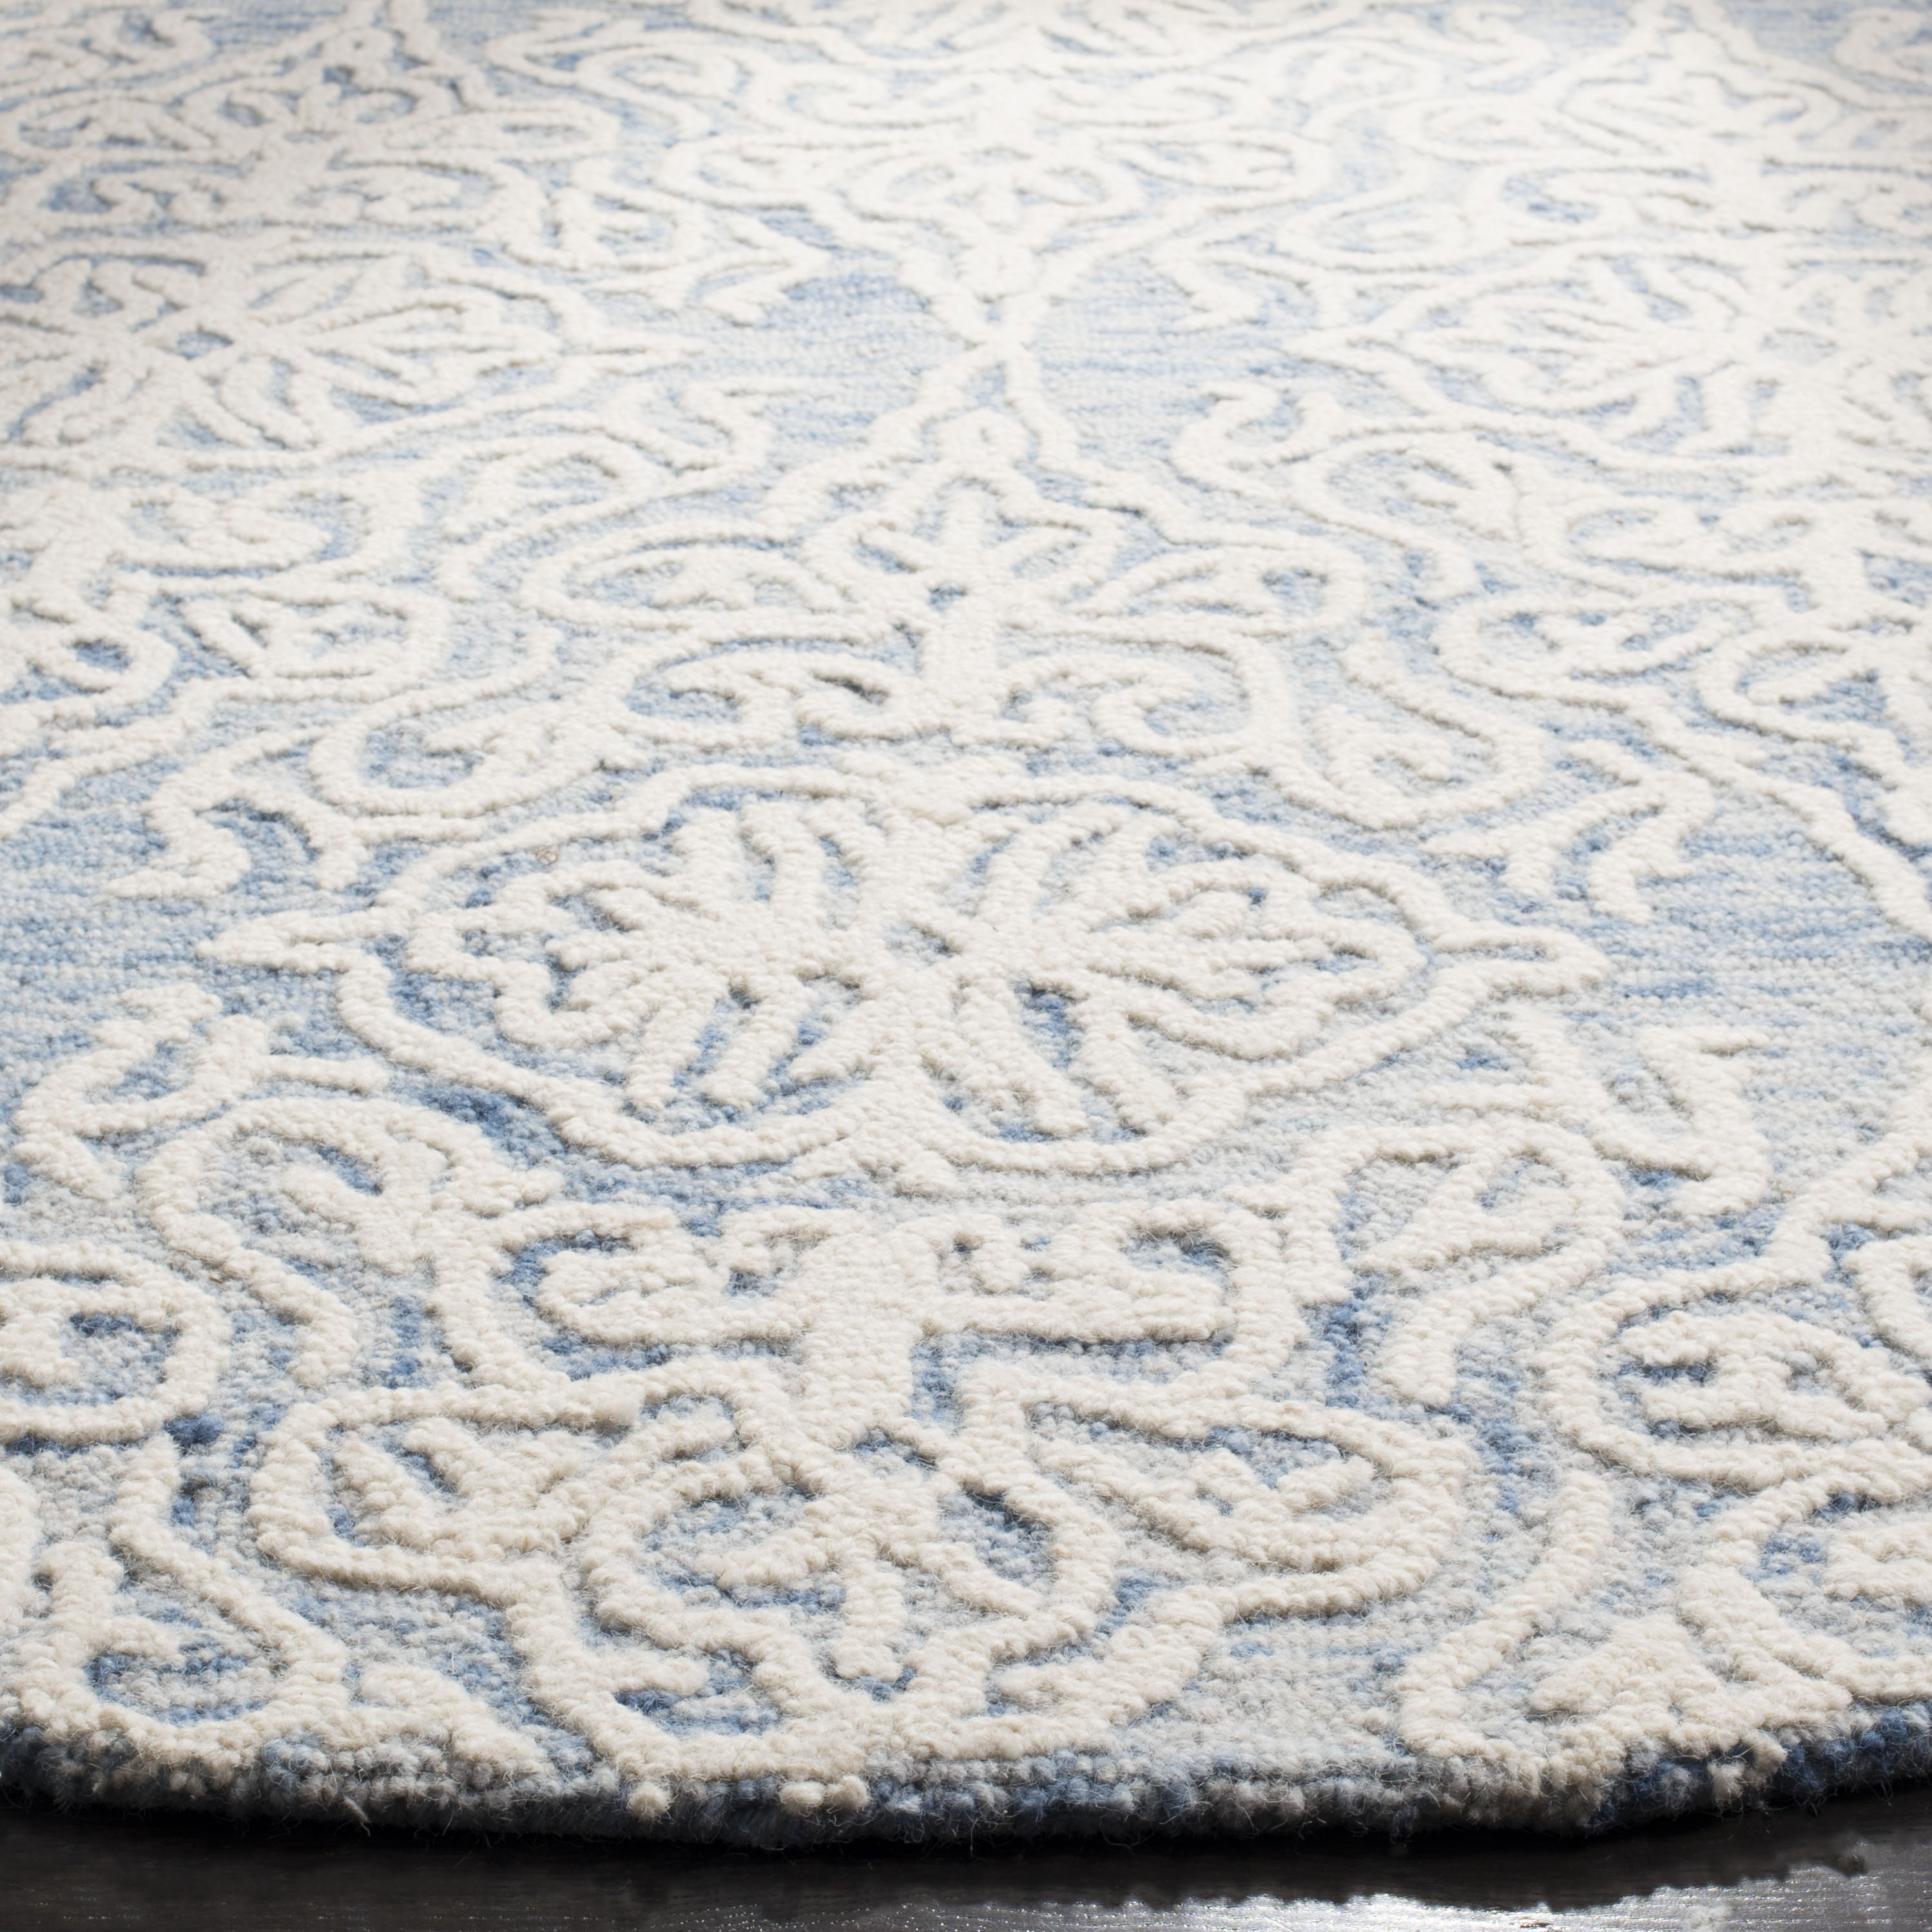 Morgan 112 6' X 6' Round Blue Wool Rug